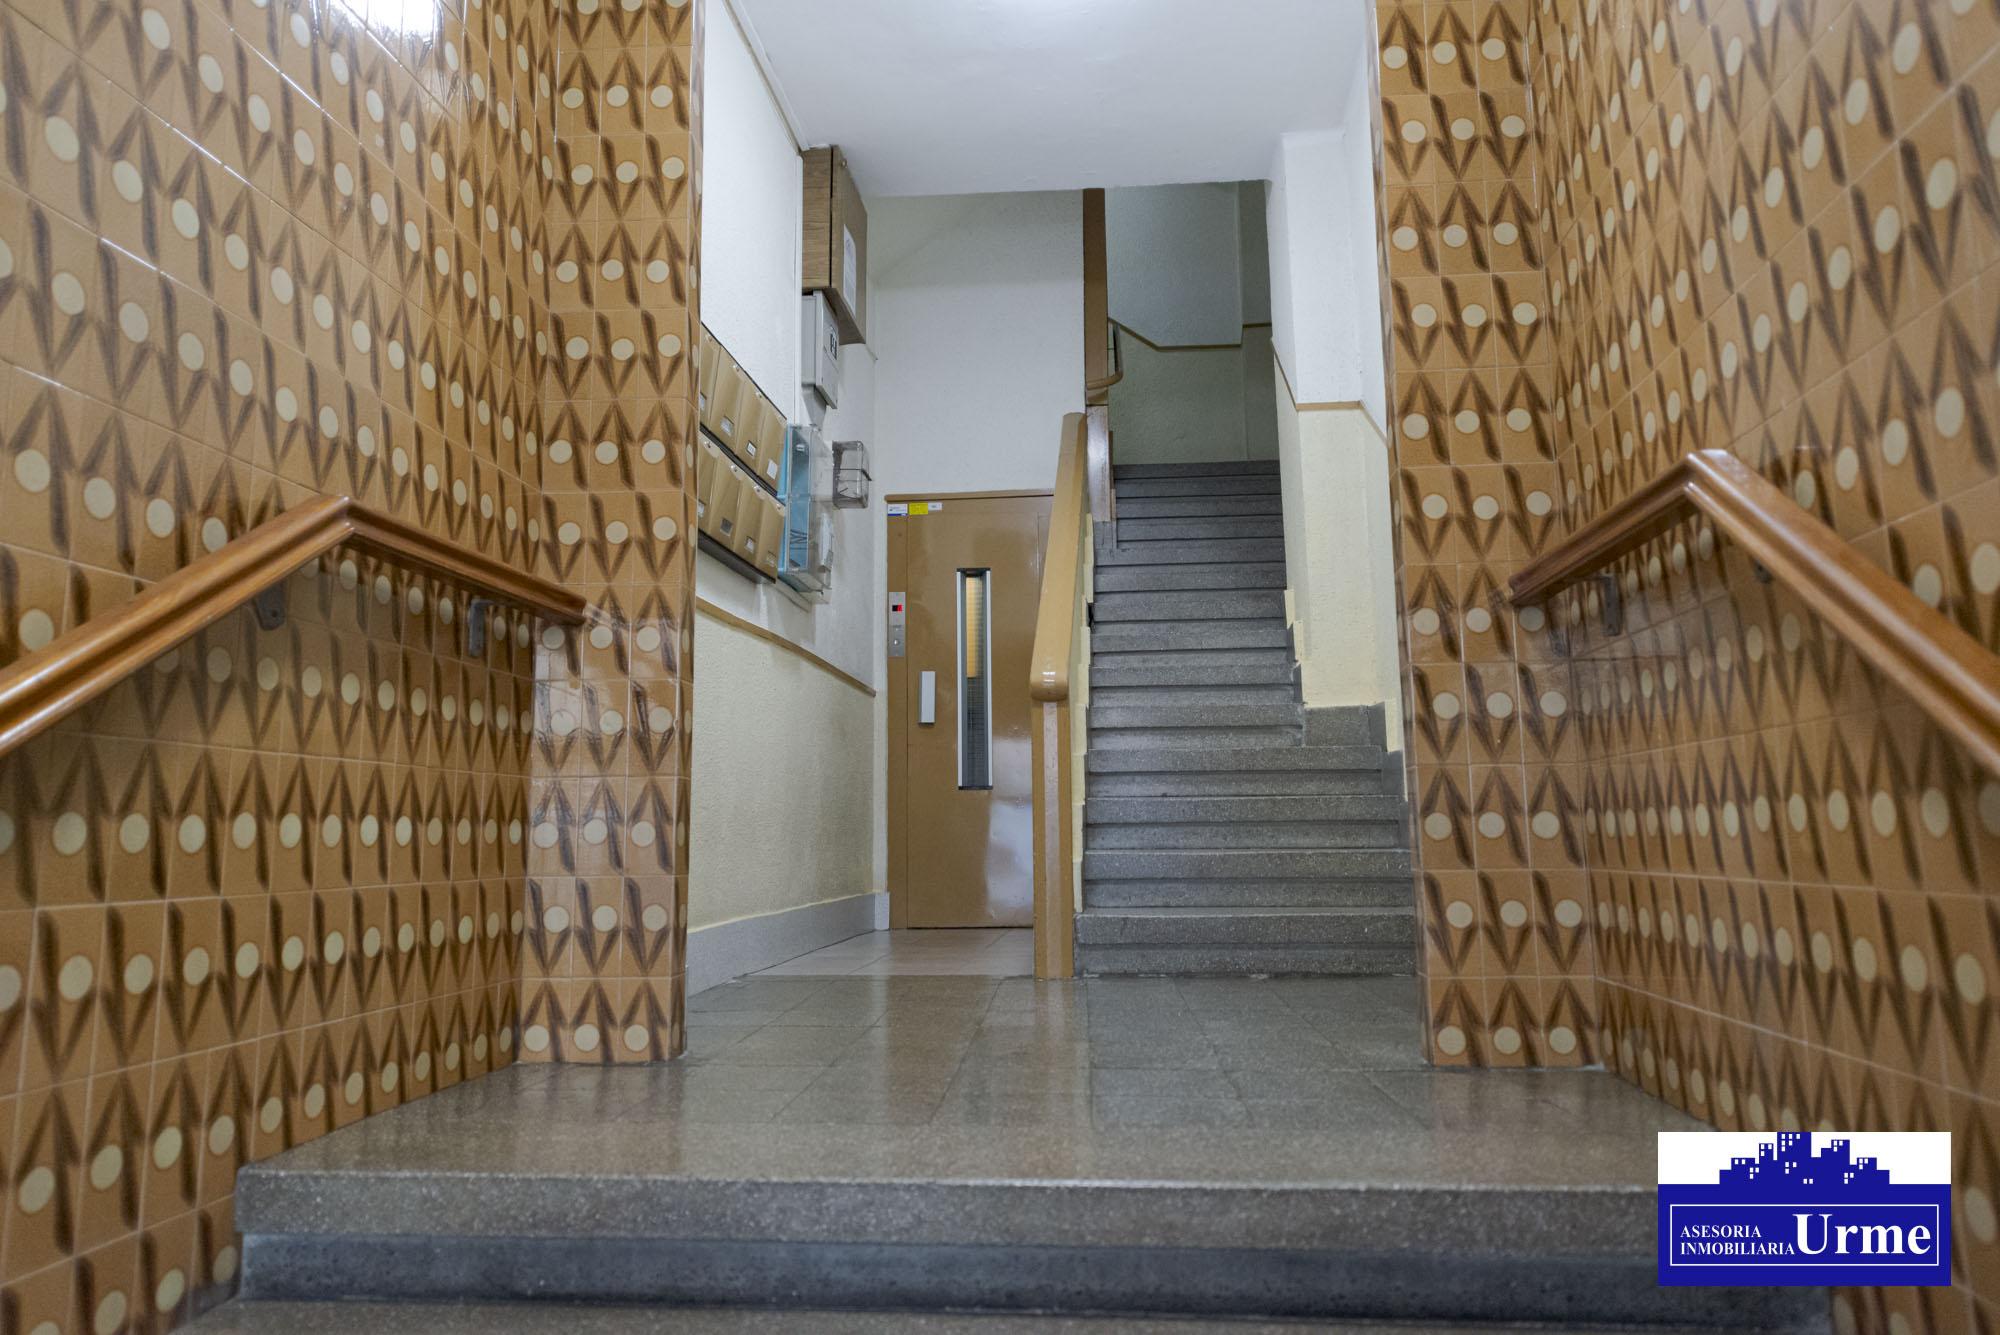 En Juan Arana, 5º planta con ascensor,70 m2 bien distribuidos, sin pasillos,3 dormitorios, armarios empotrados,salon,cocina equipada,baño, balcon Sur,  trastero. Ven a visitarlo!